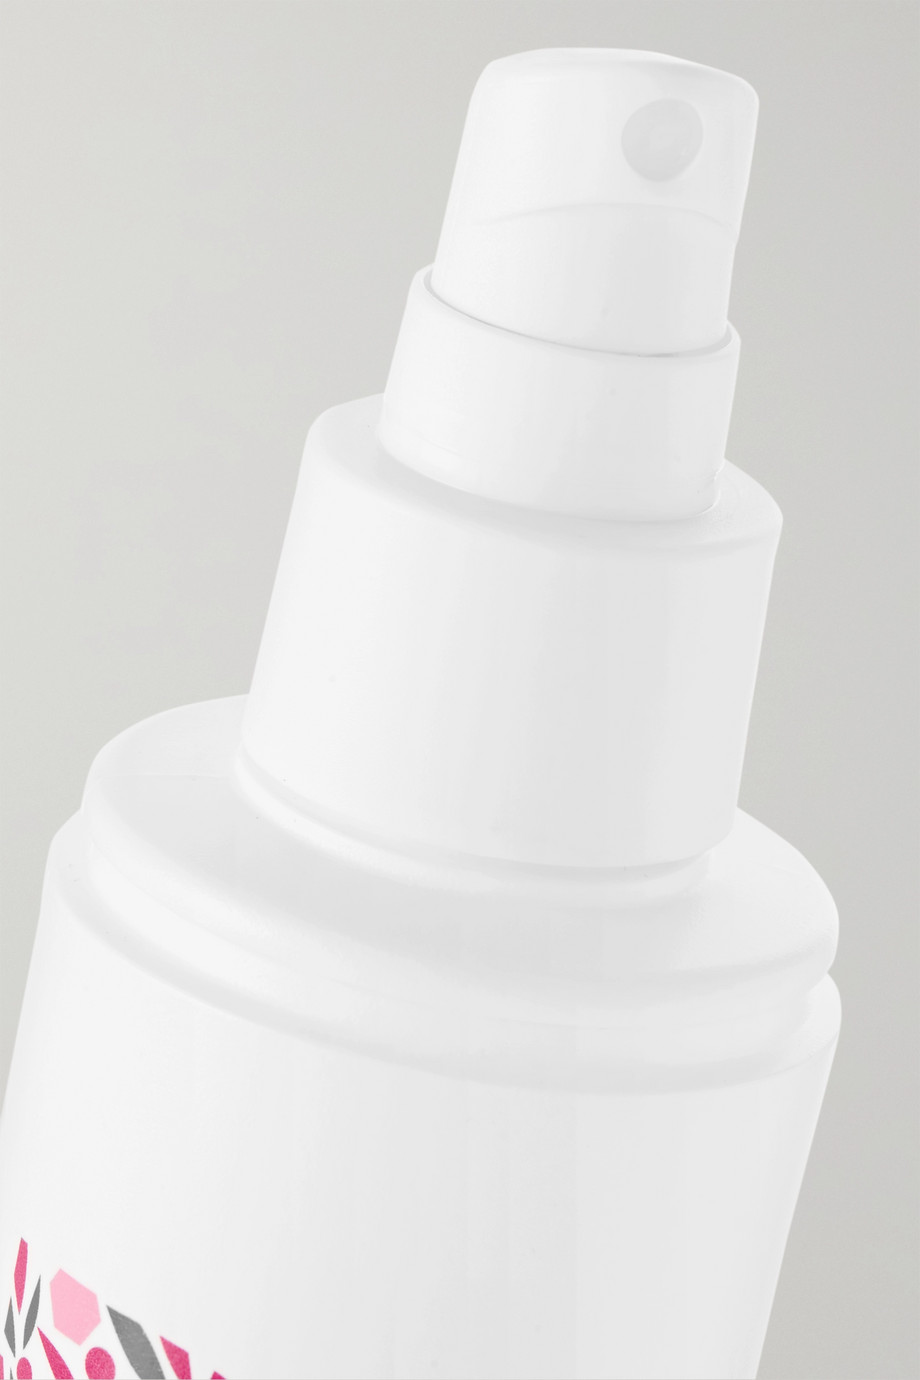 Briogeo Farewell Frizz Rosarco Milk Leave-In Conditioning Spray, 147ml